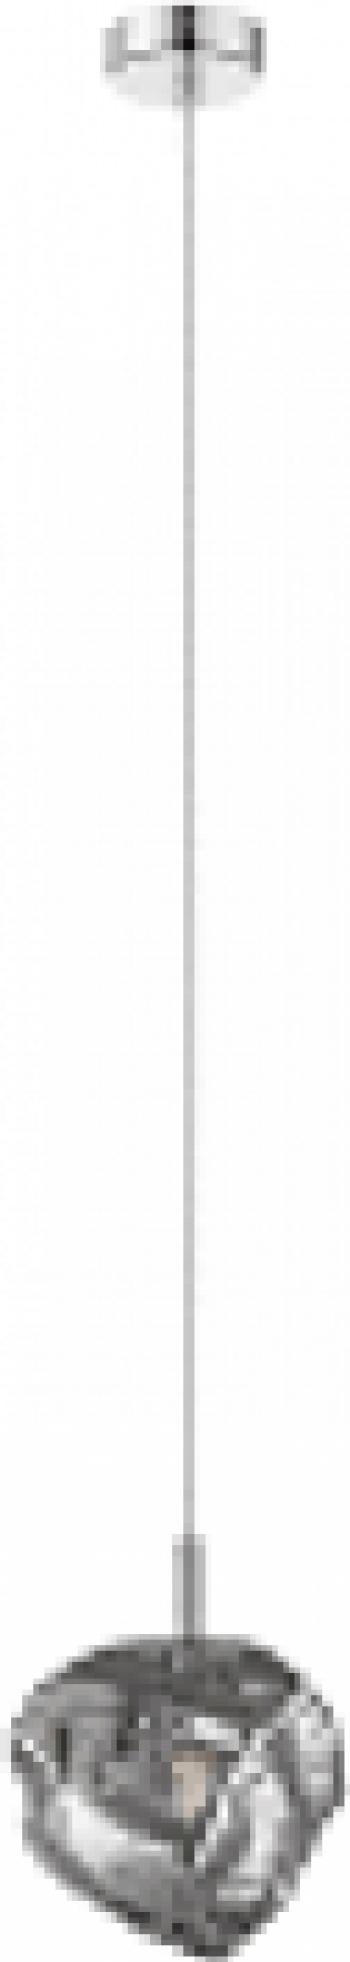 LUSTRA ROCK P0488-01F-F4FZ Corpuri de iluminat